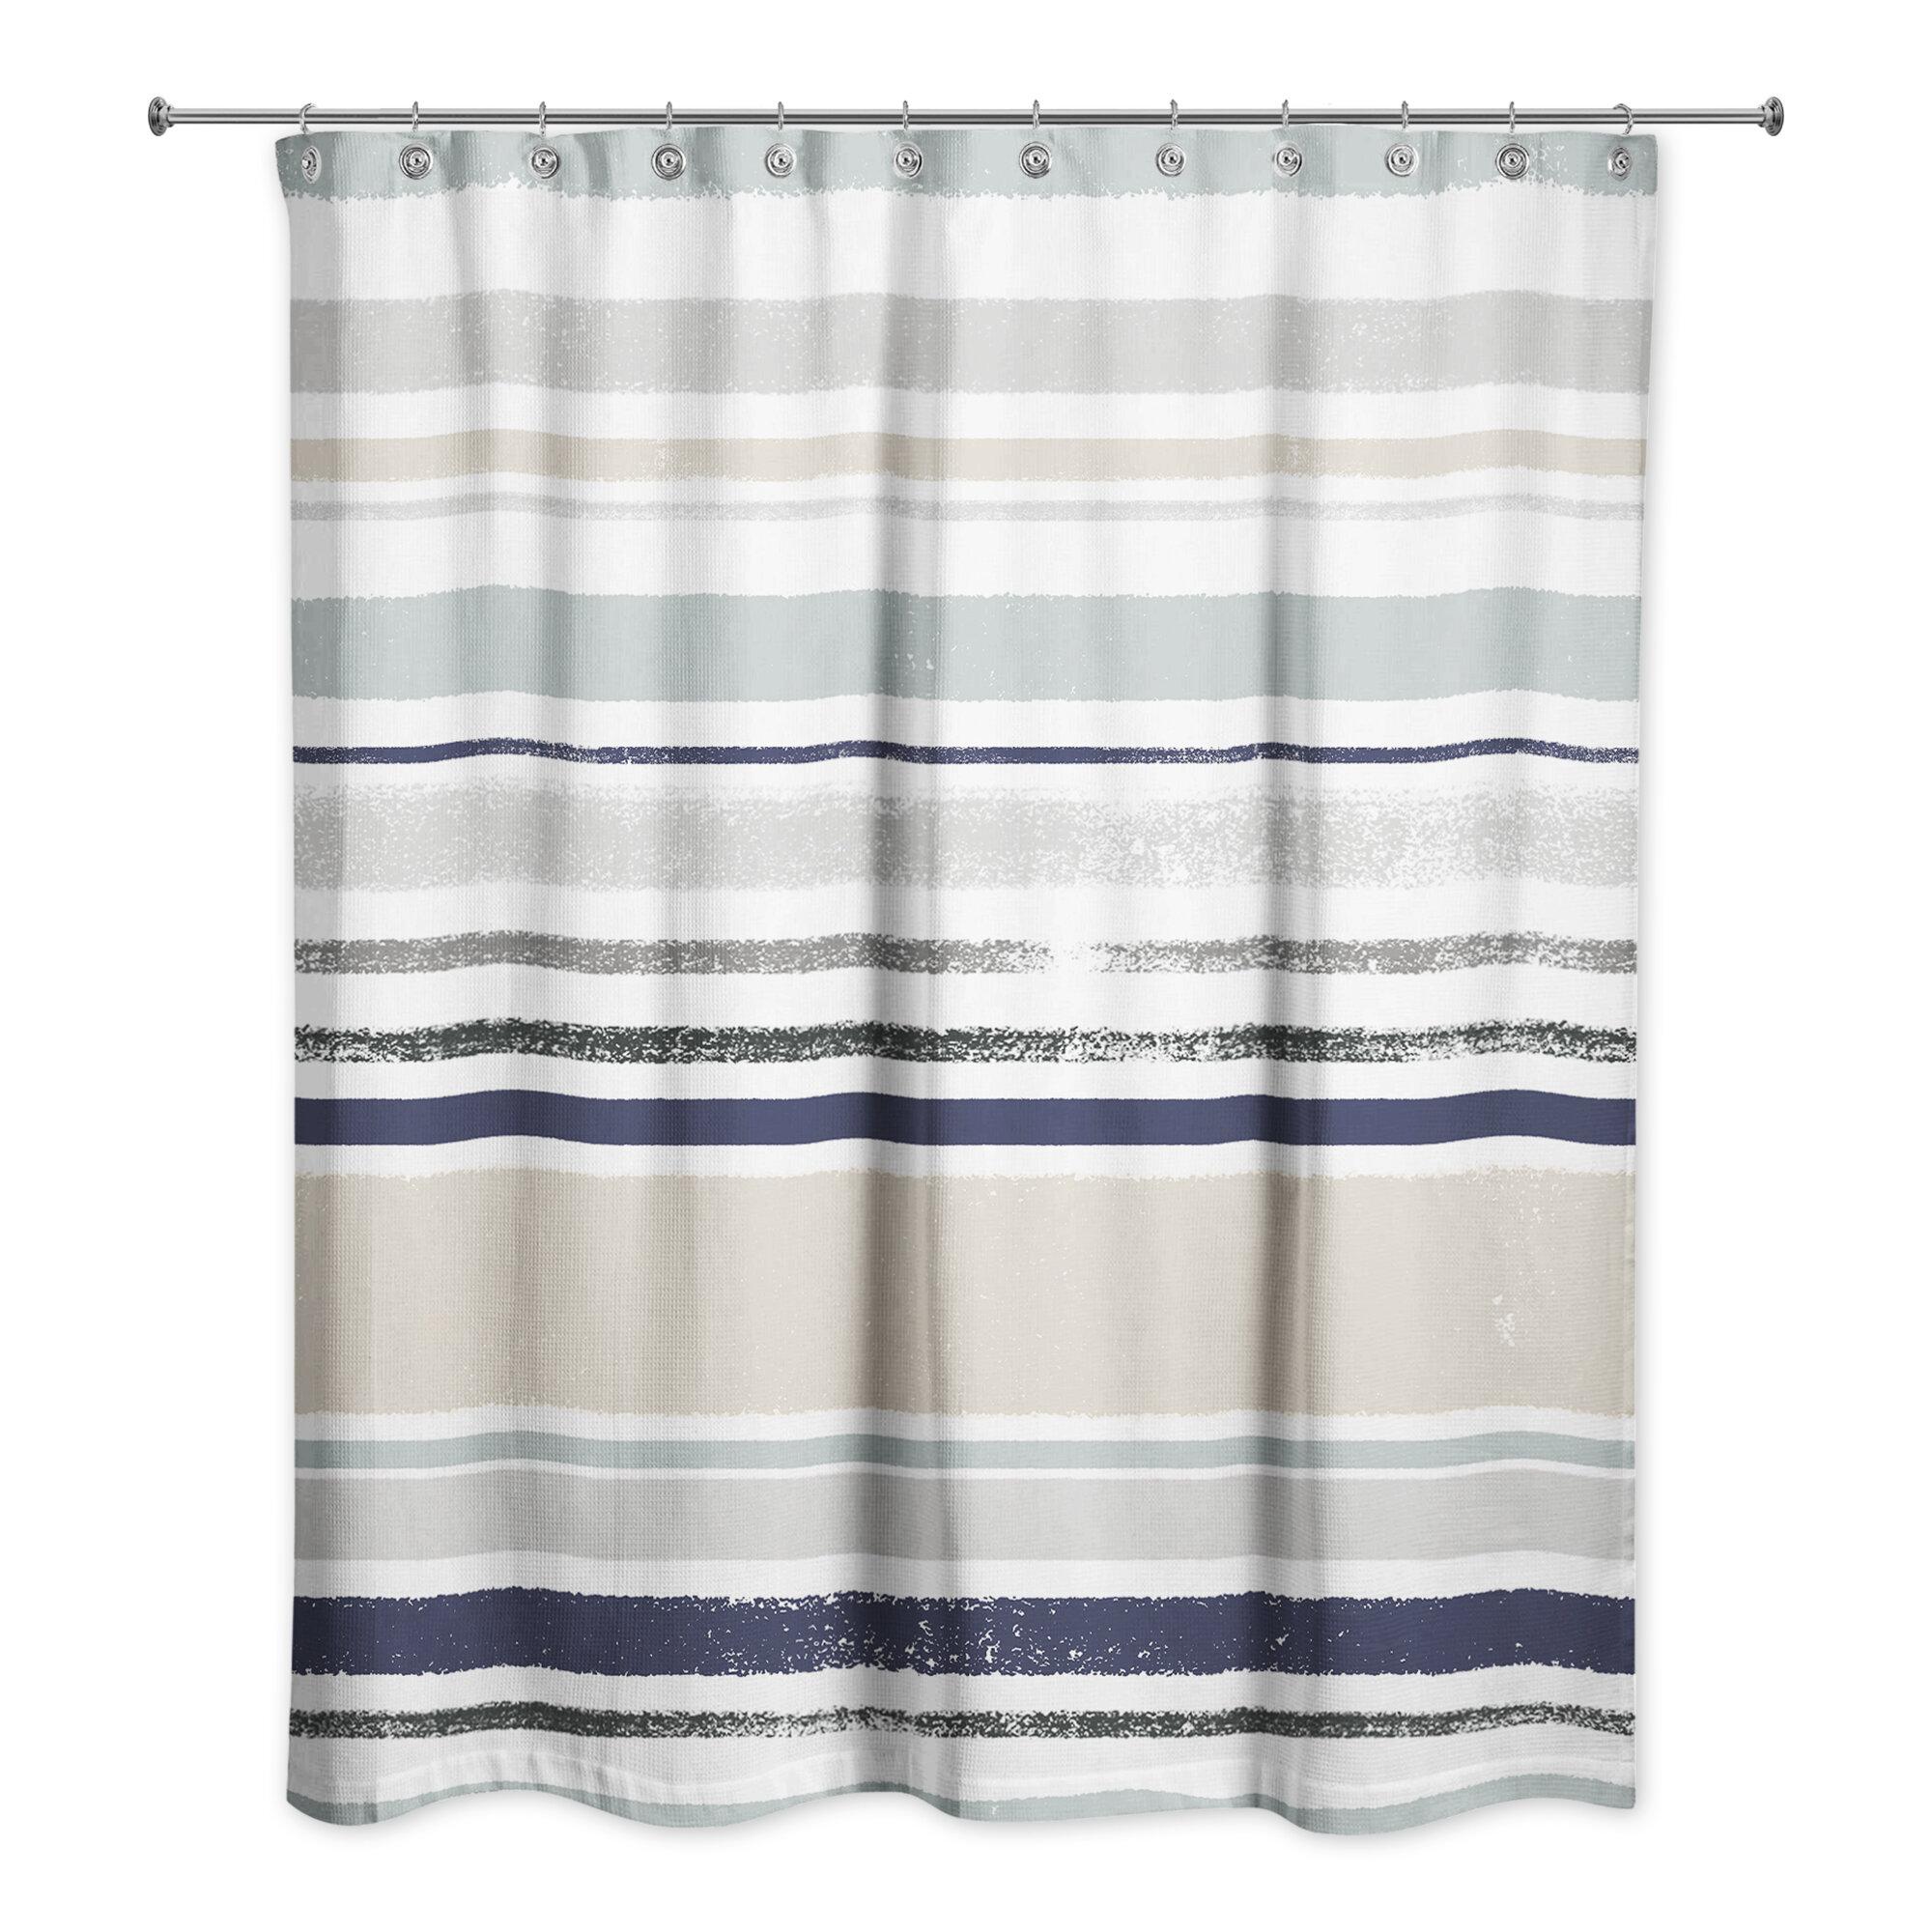 Rosecliff Heights Stenberg Striped Single Shower Curtain Wayfair